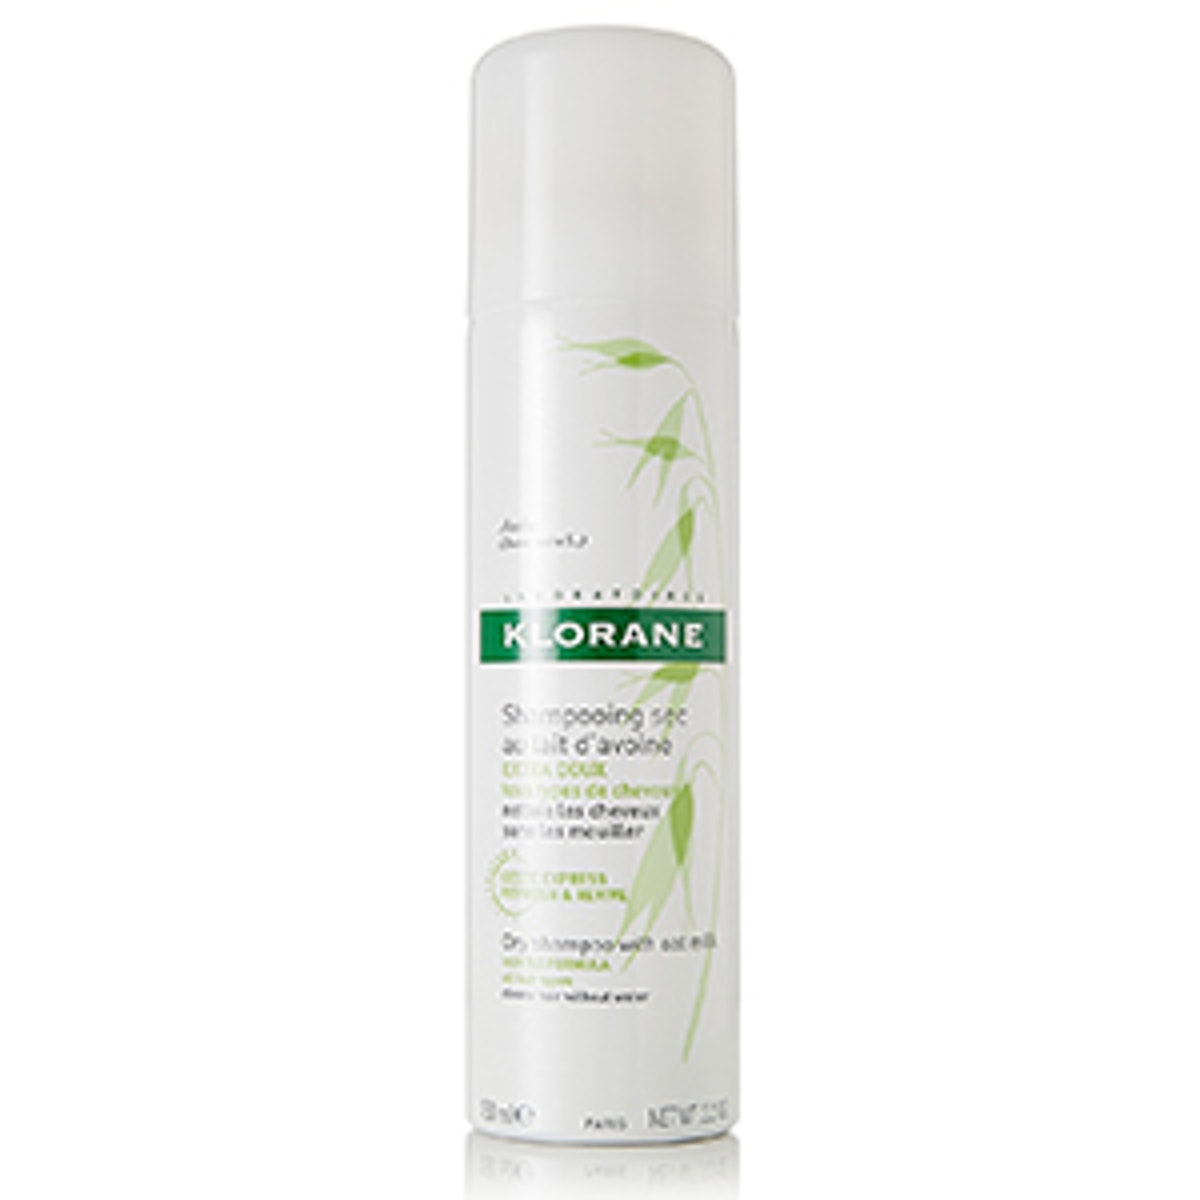 Dry Shampoo with Oat Milk